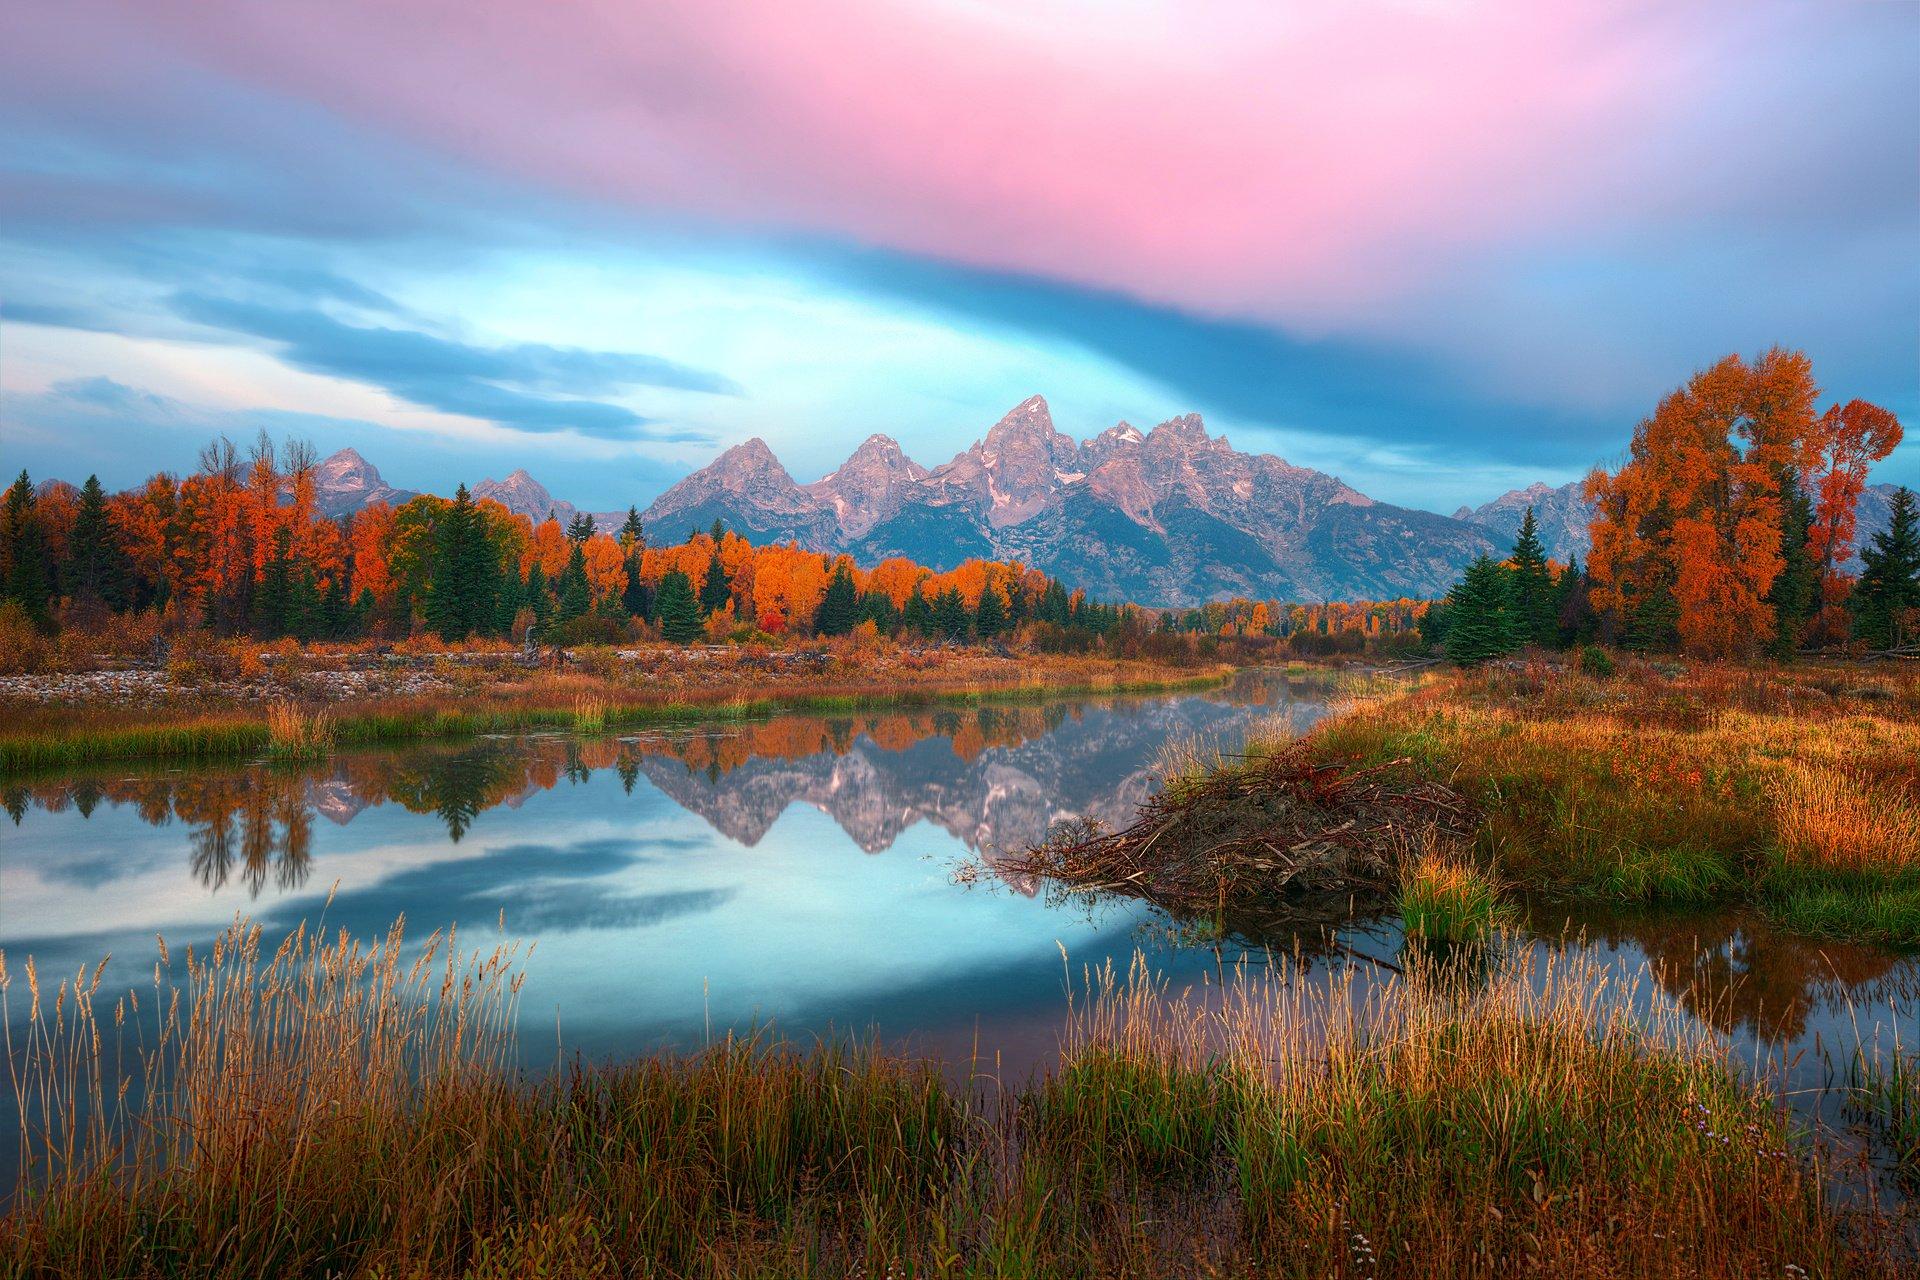 Fall Wallpaper For Large Monitors Usa Wyoming Autumn River Lake Reflection Mountain